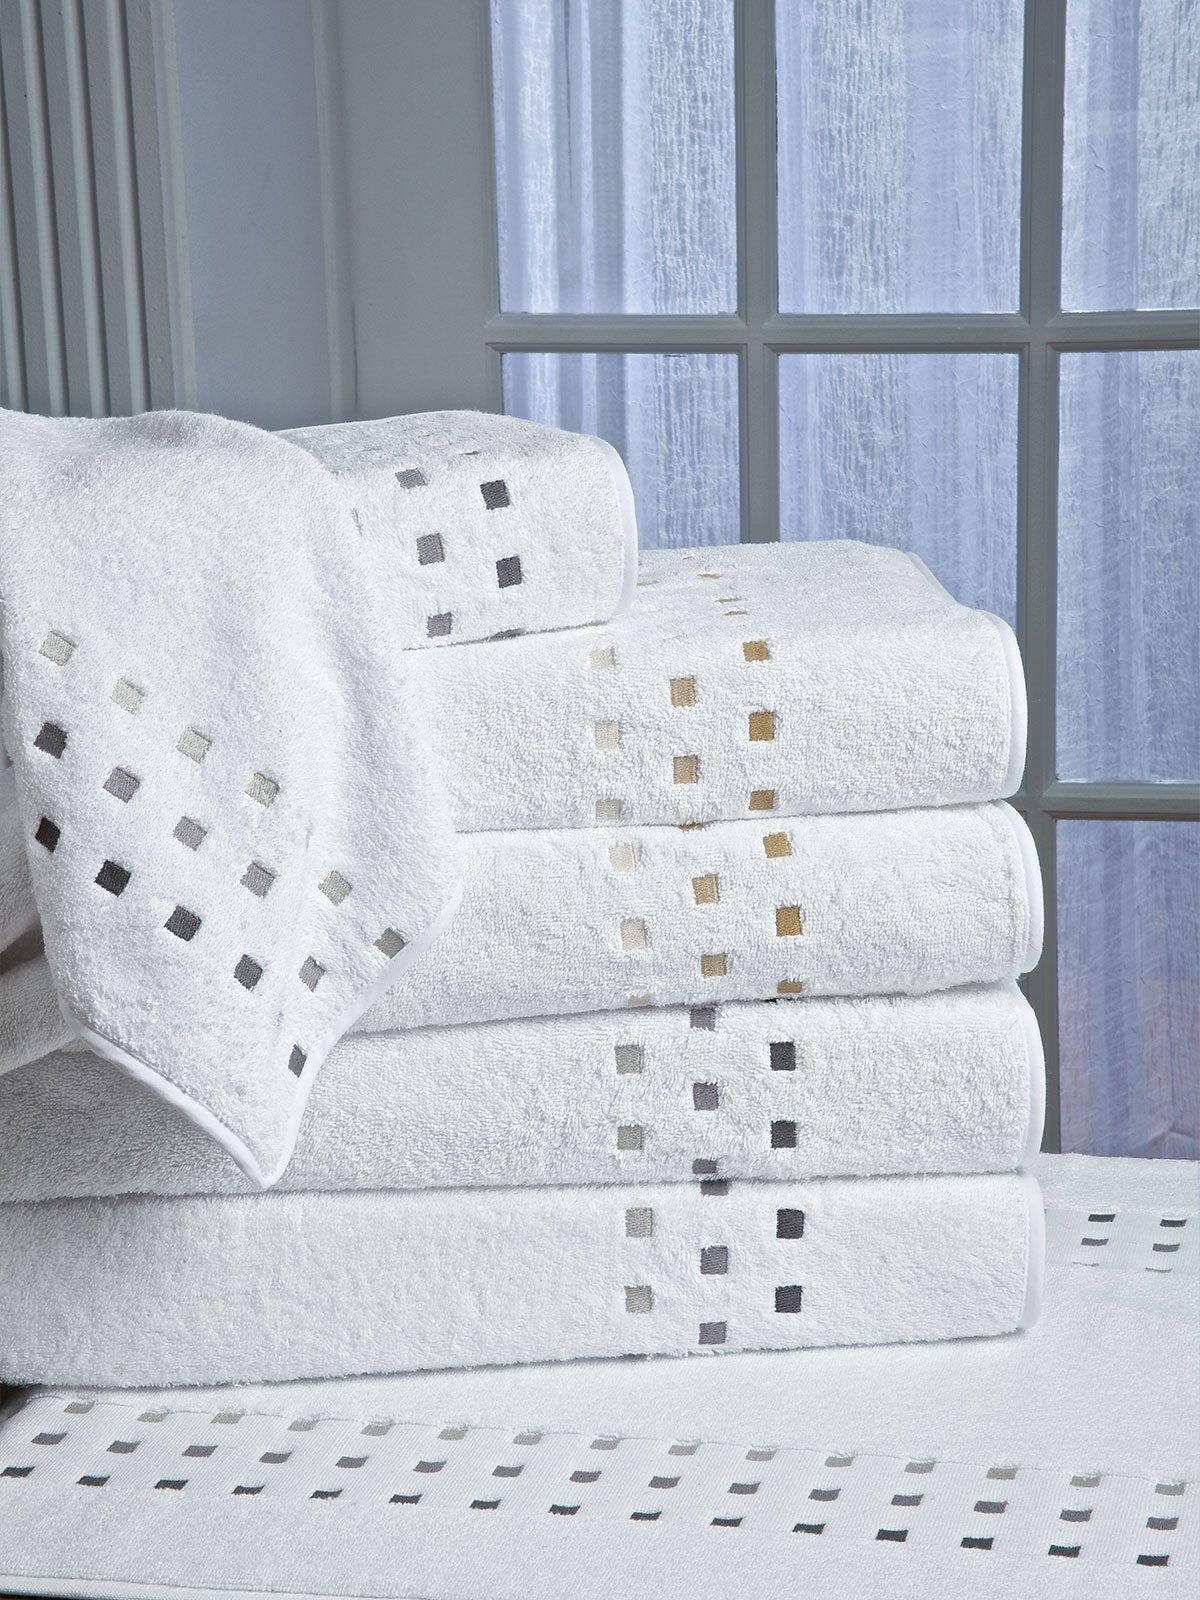 Trafalgar Square Bath Collection Luxury Bath Linen